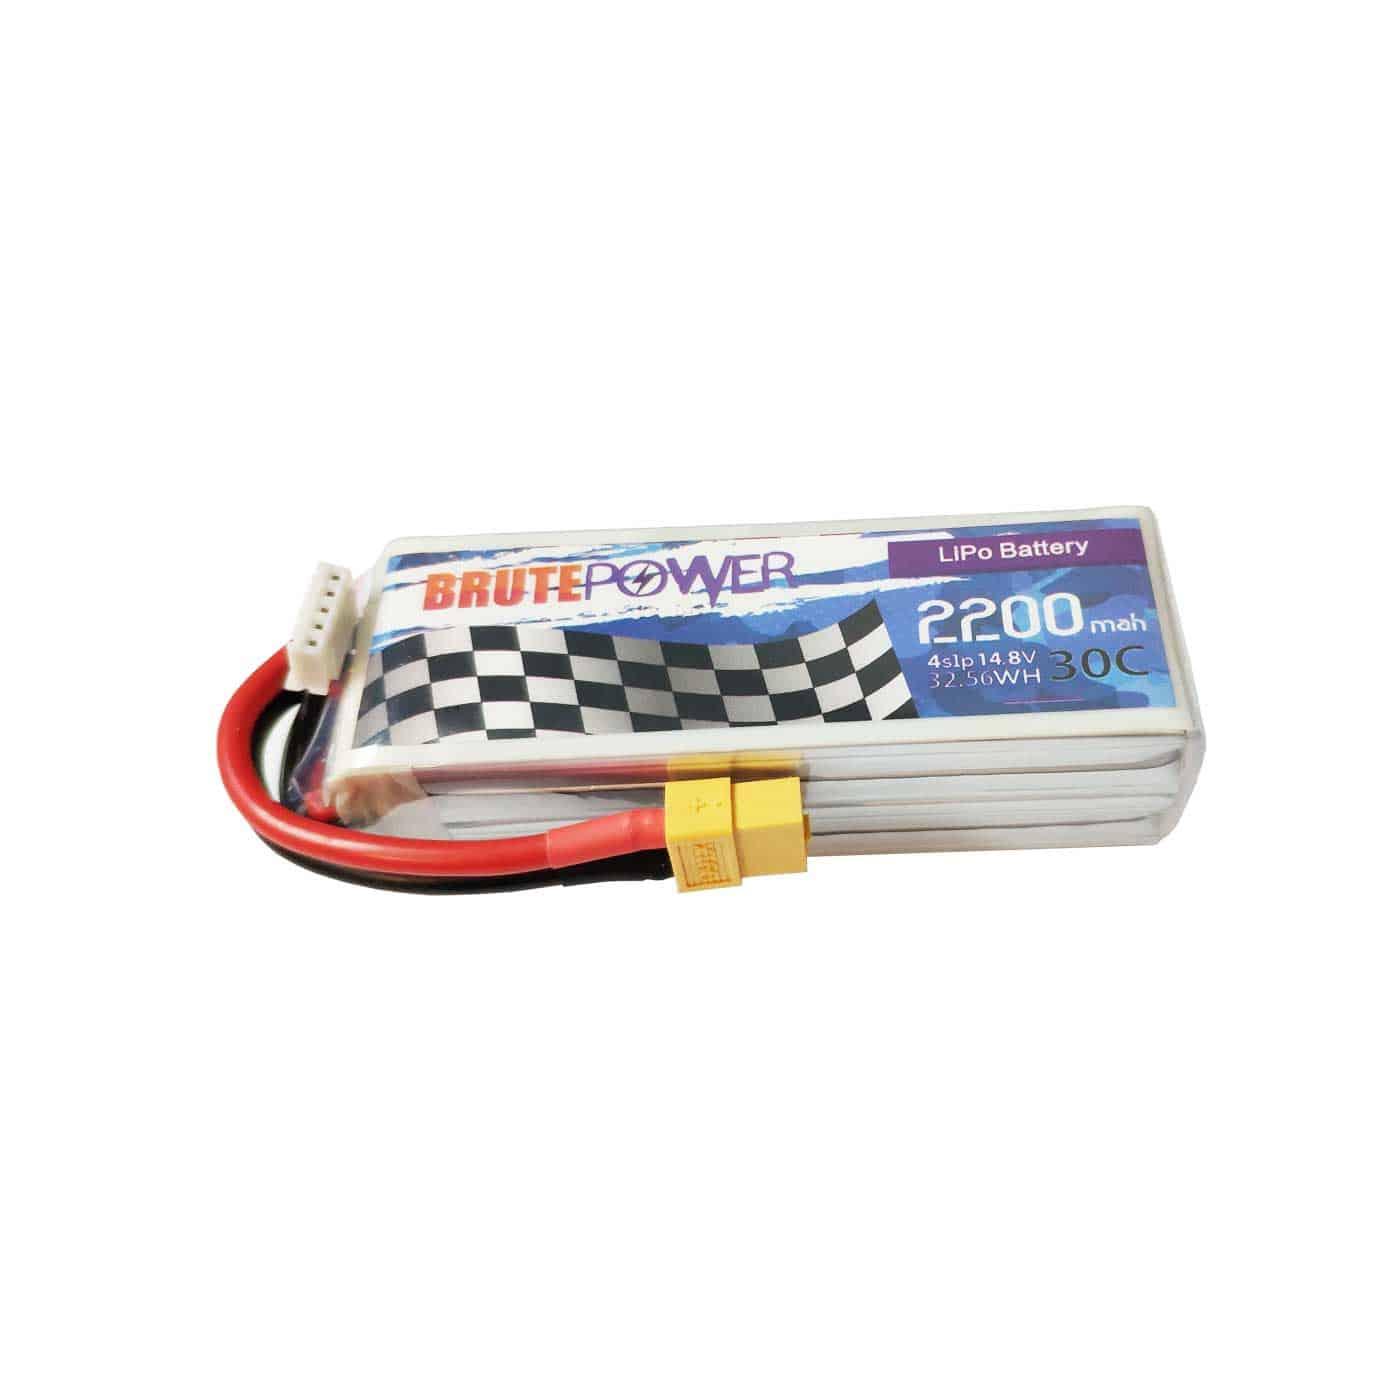 batería lipo brutepower 4s 2200mah 30C